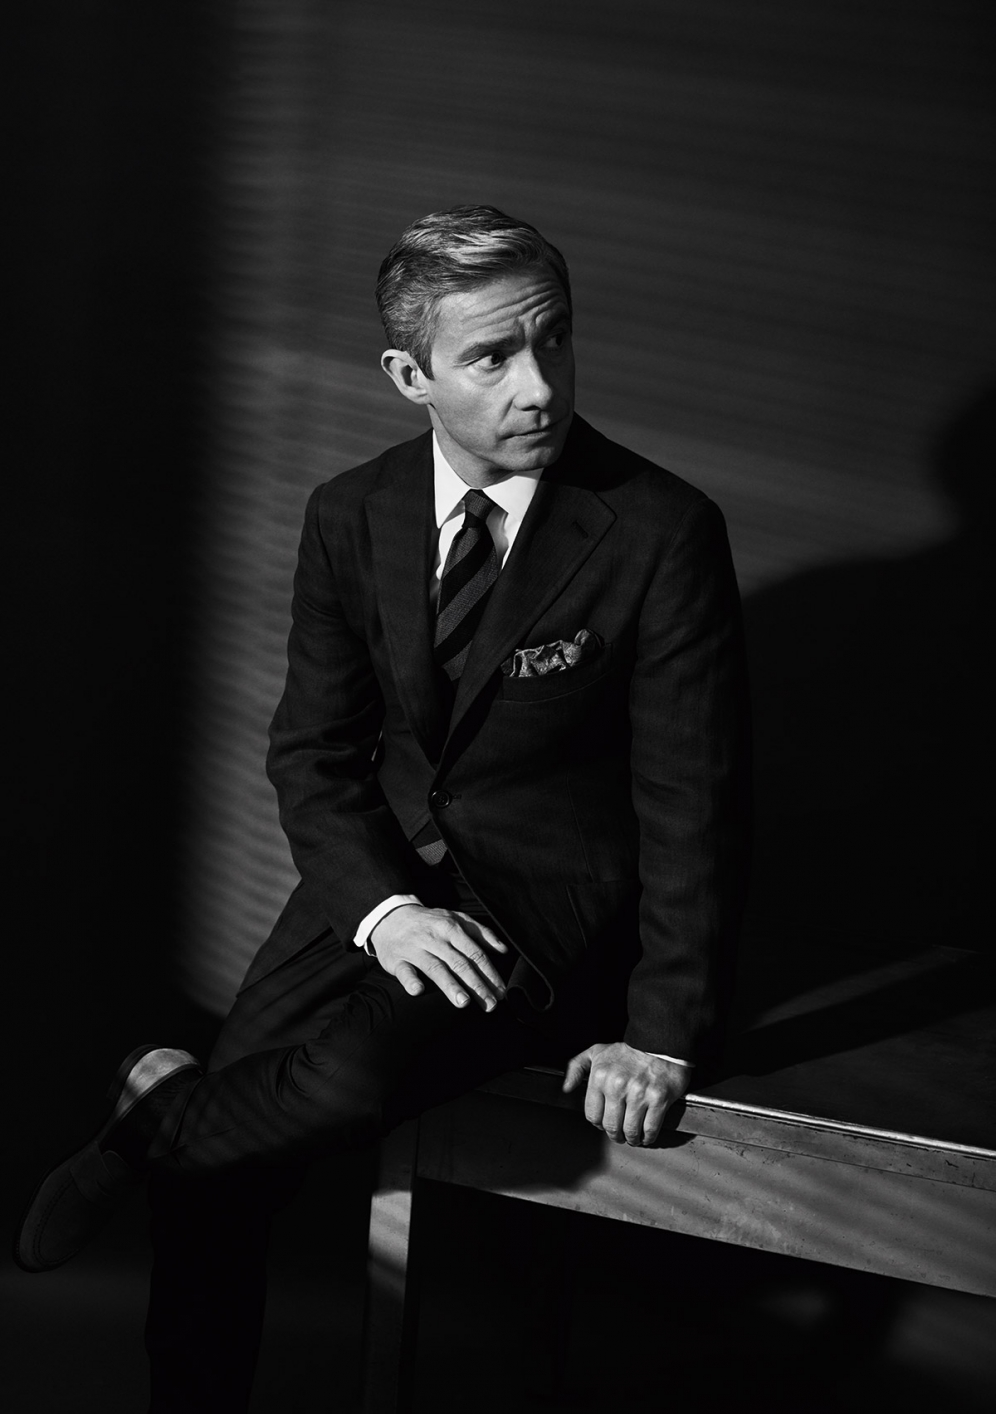 The Jackal | Martin Freeman